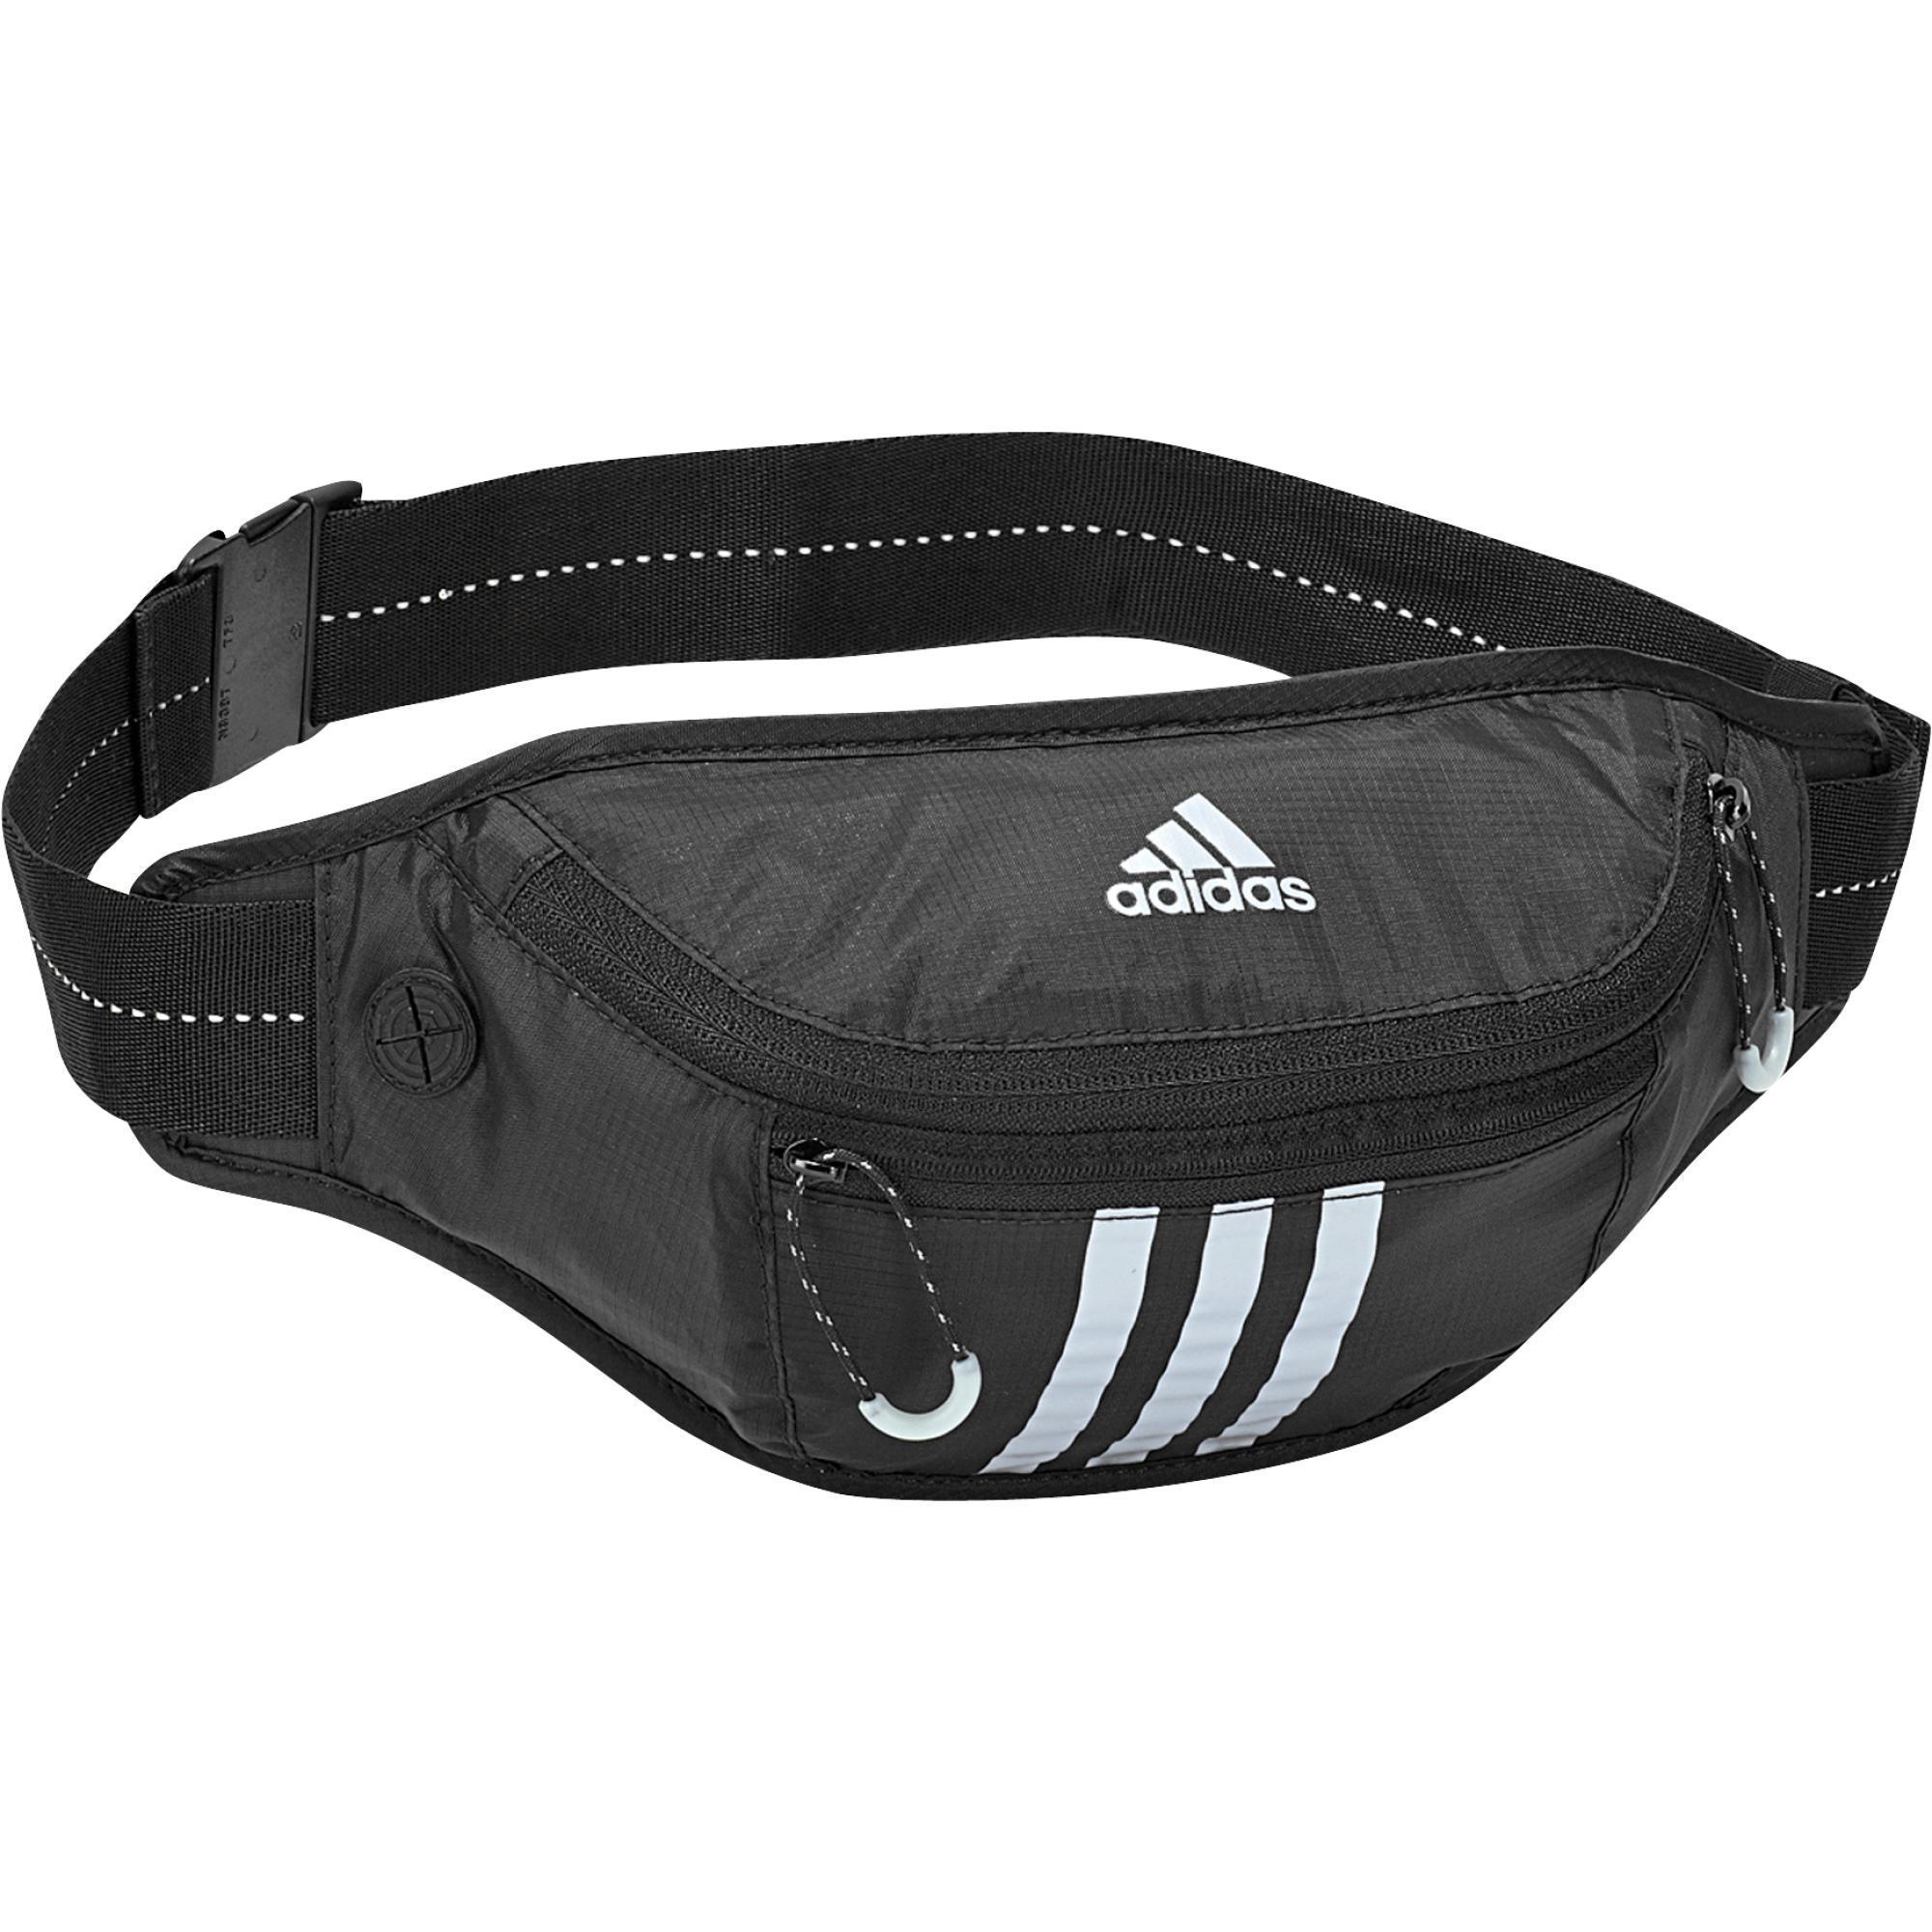 11bda51e6978 Adidas Run Load 3S Belt - Black Silver - Tennisnuts.com